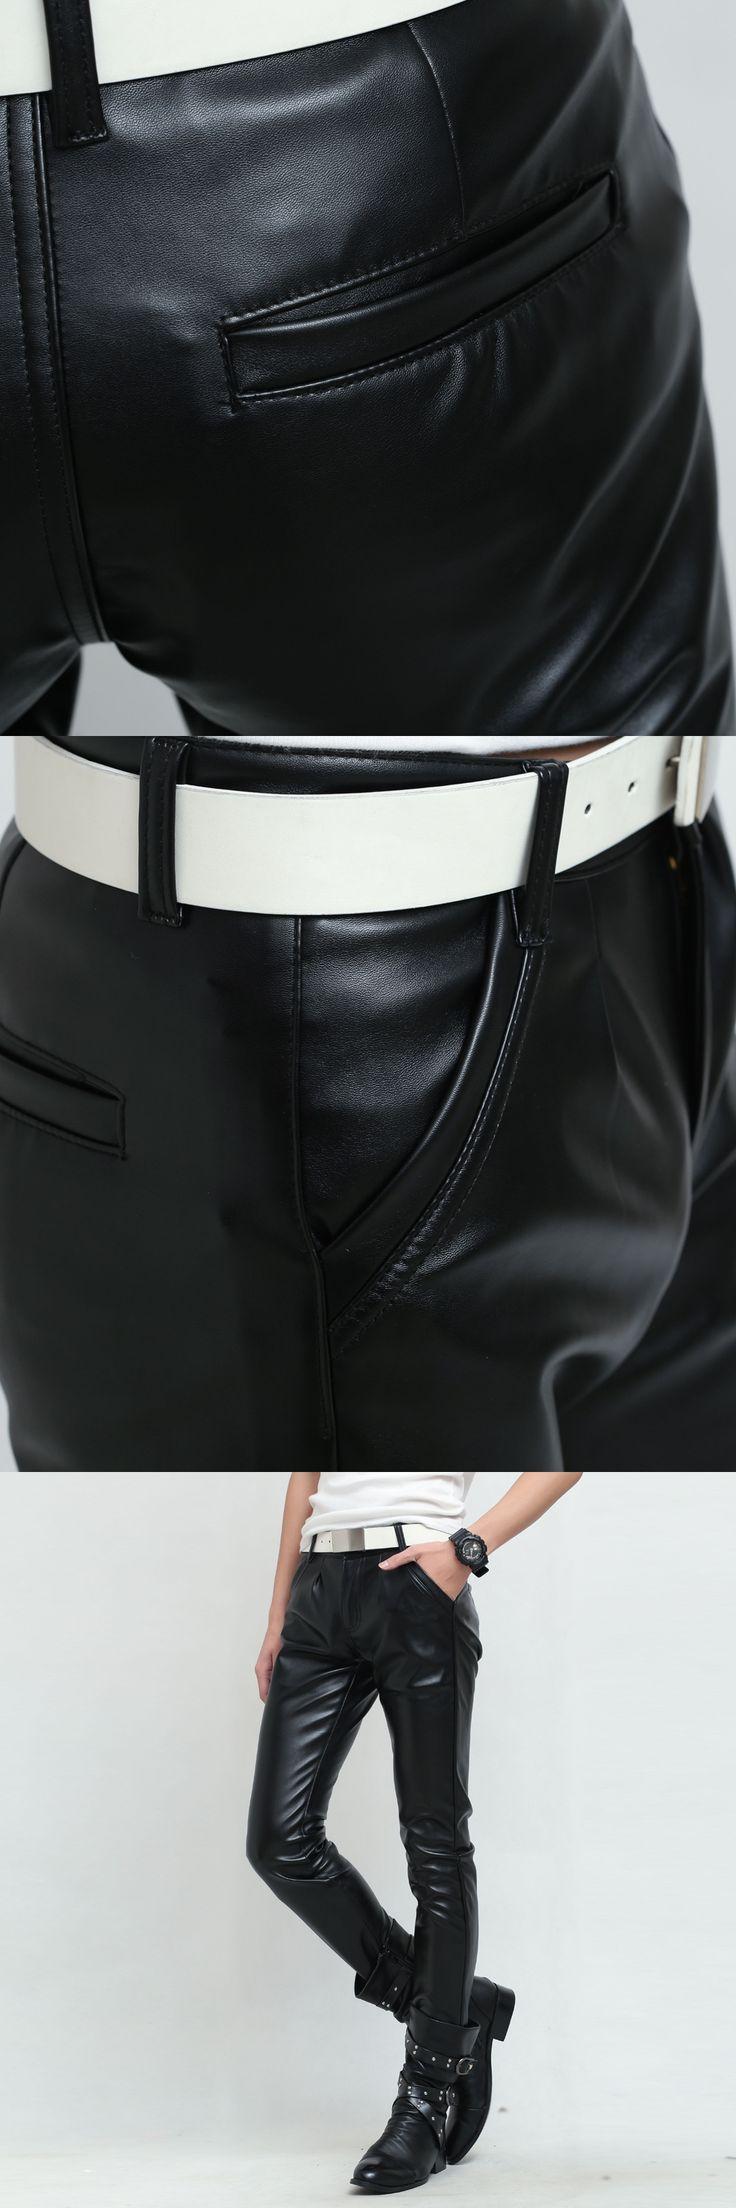 Metrosexual Nightclub Velvet Warm Hip Hop Joggers Mens Leather Trousers PU Mens Fashion Leggings Mens Casual Pants Mens Jogger